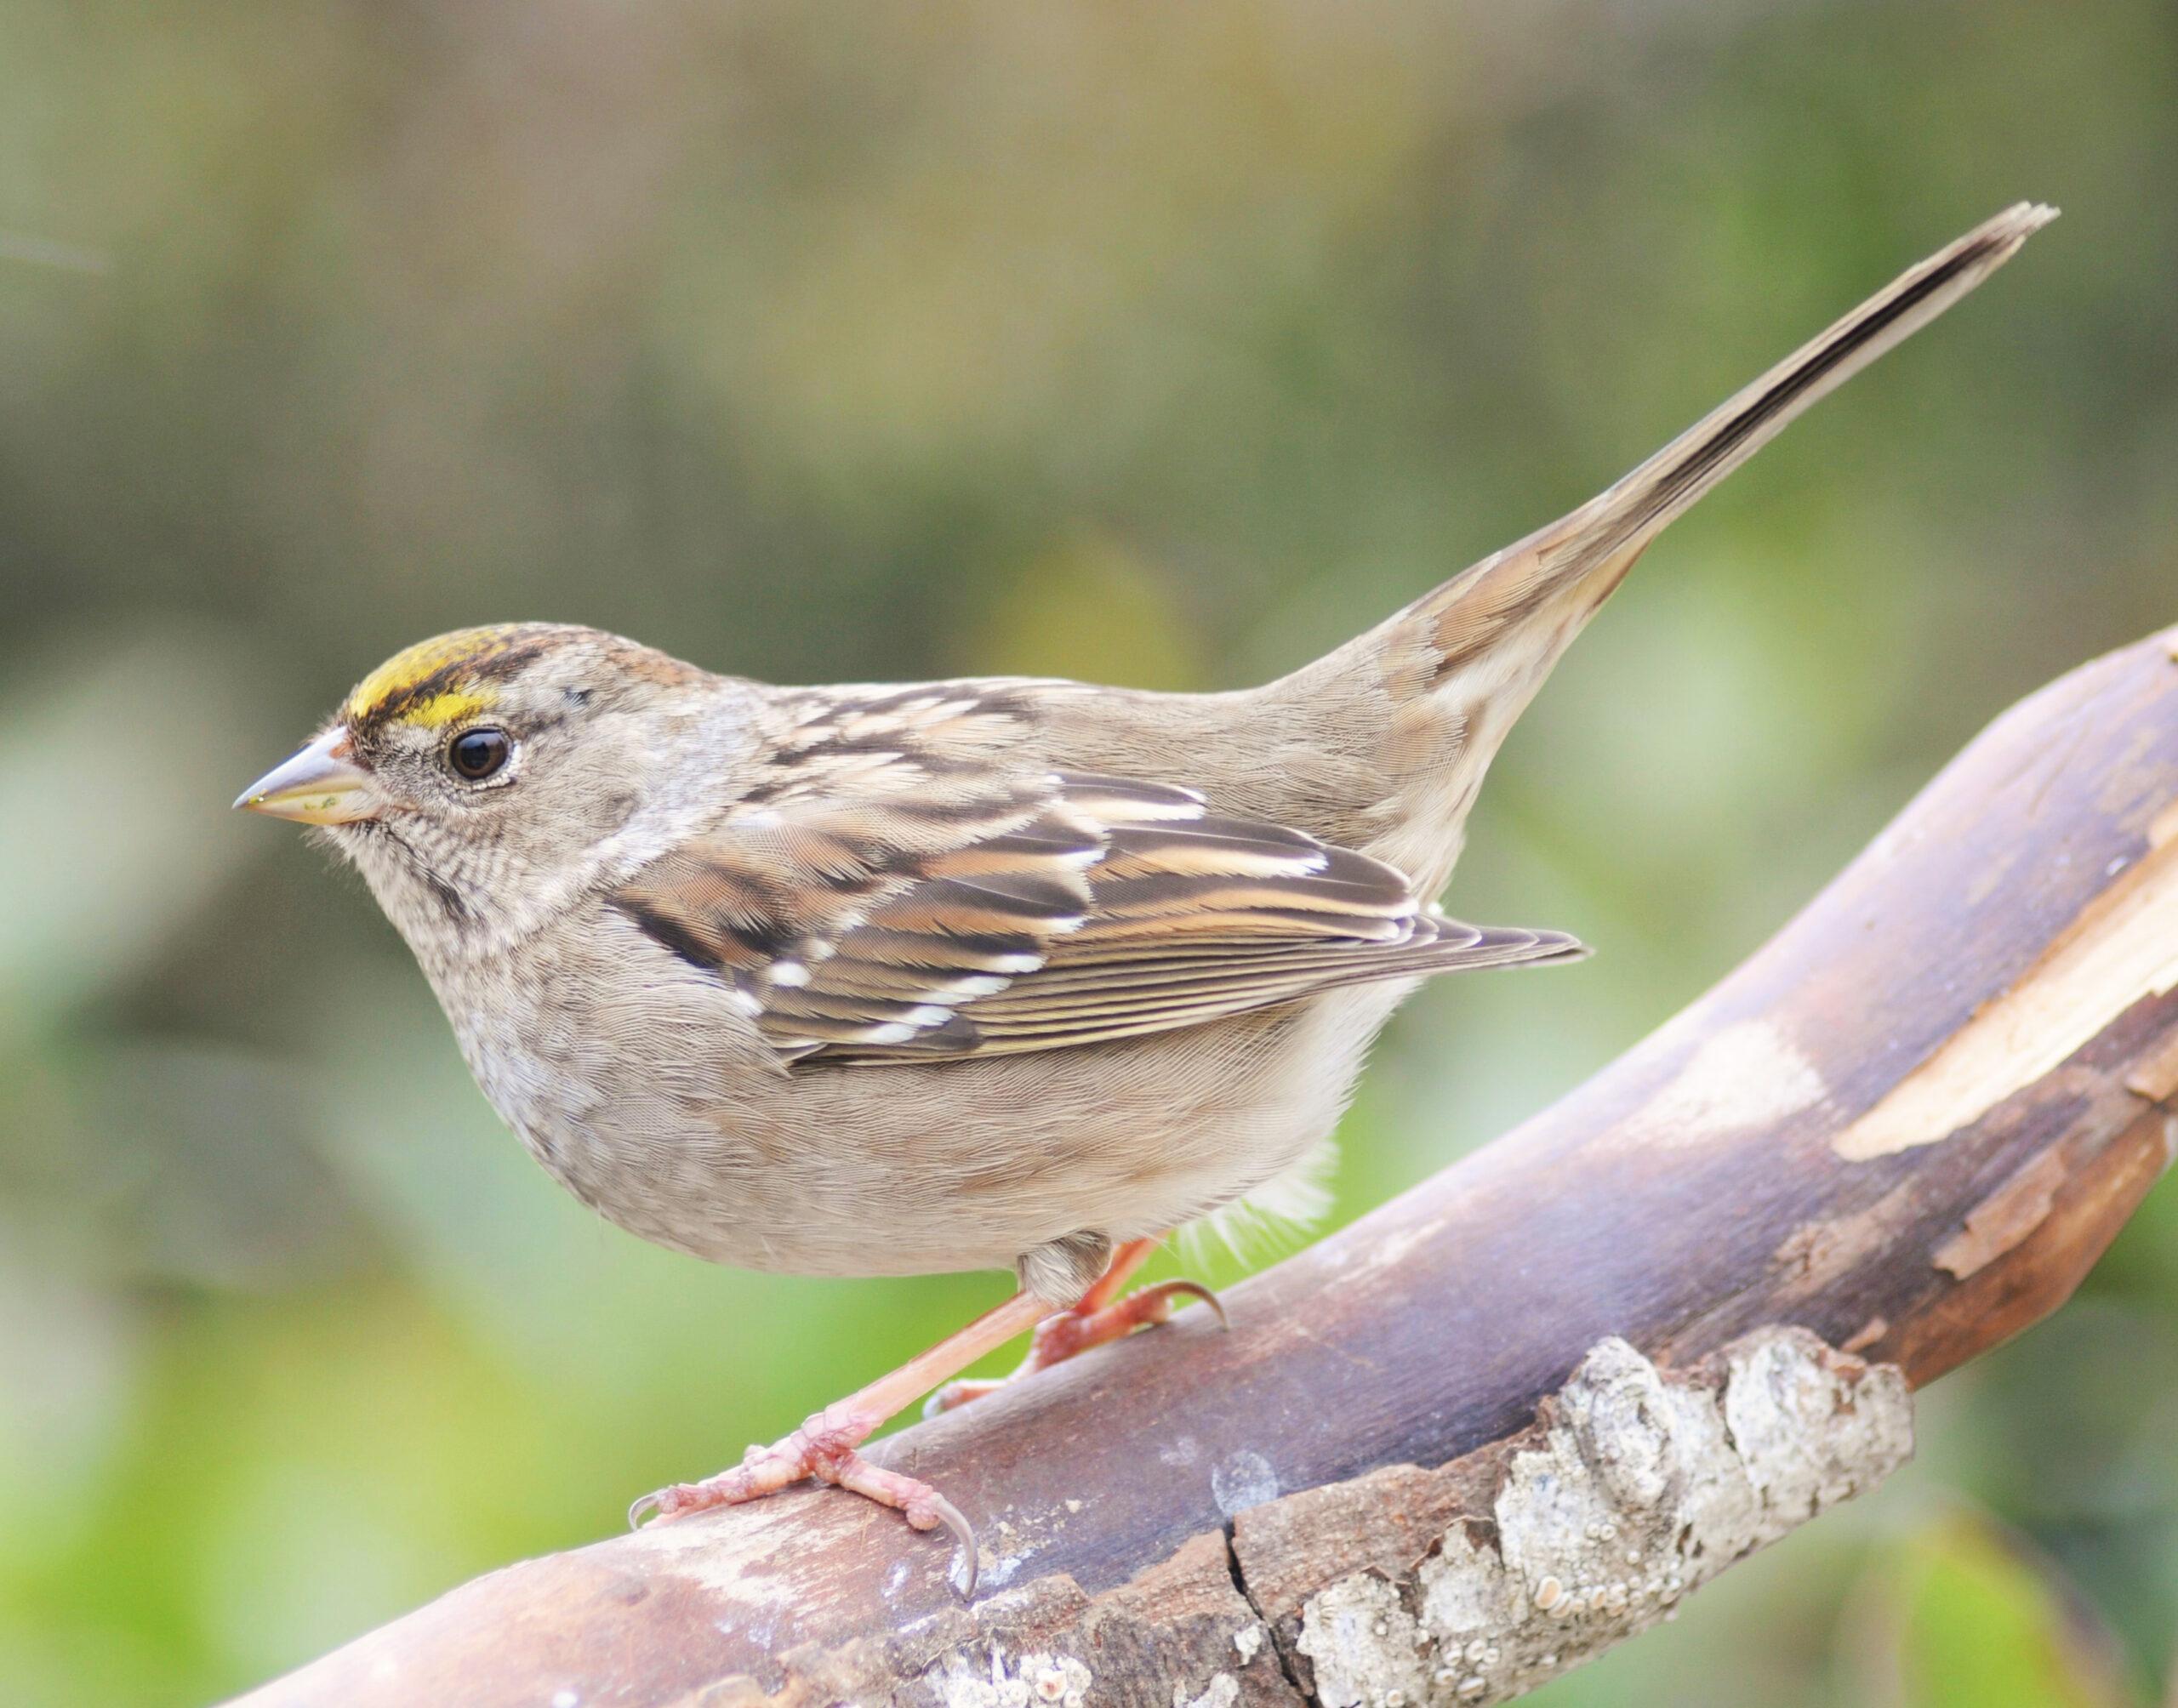 sparrow found in wildlife area